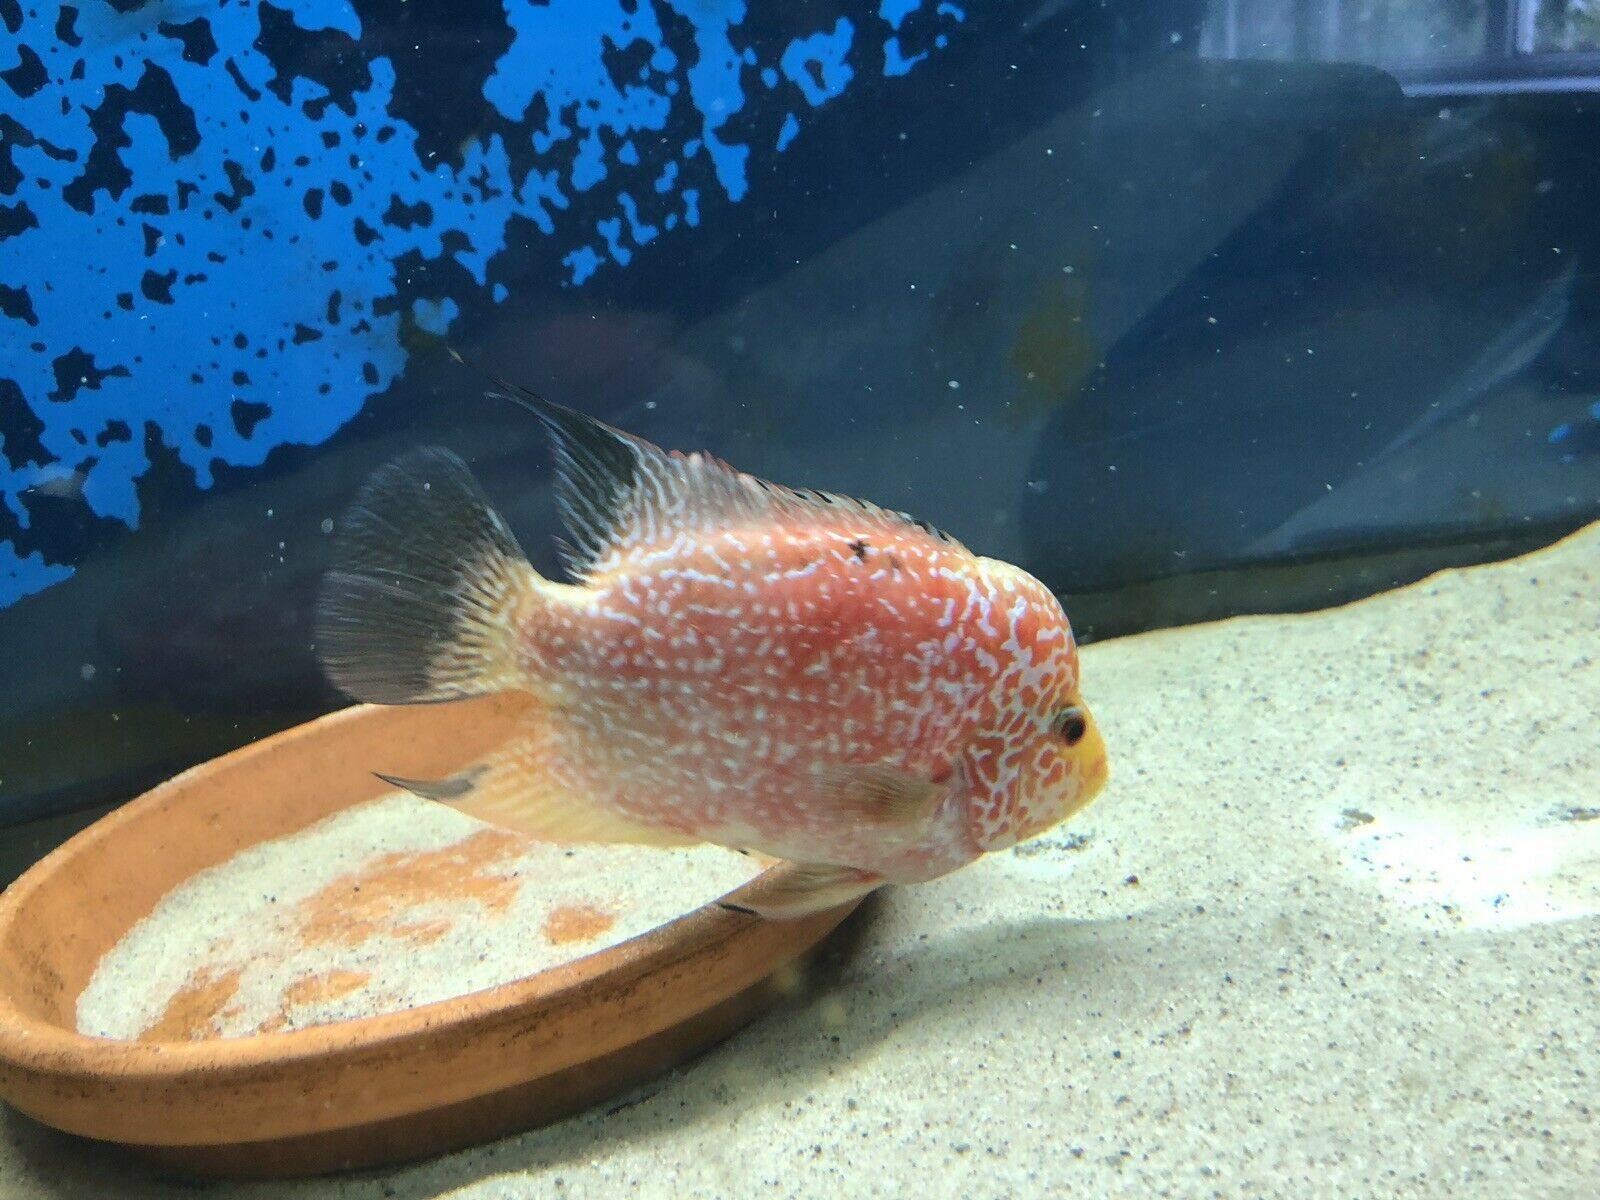 Female Gb Flowerhorn Cichlid Approx 6 Inch Very Nice Fish Luxury Pet Parrot Fish Fish Pet